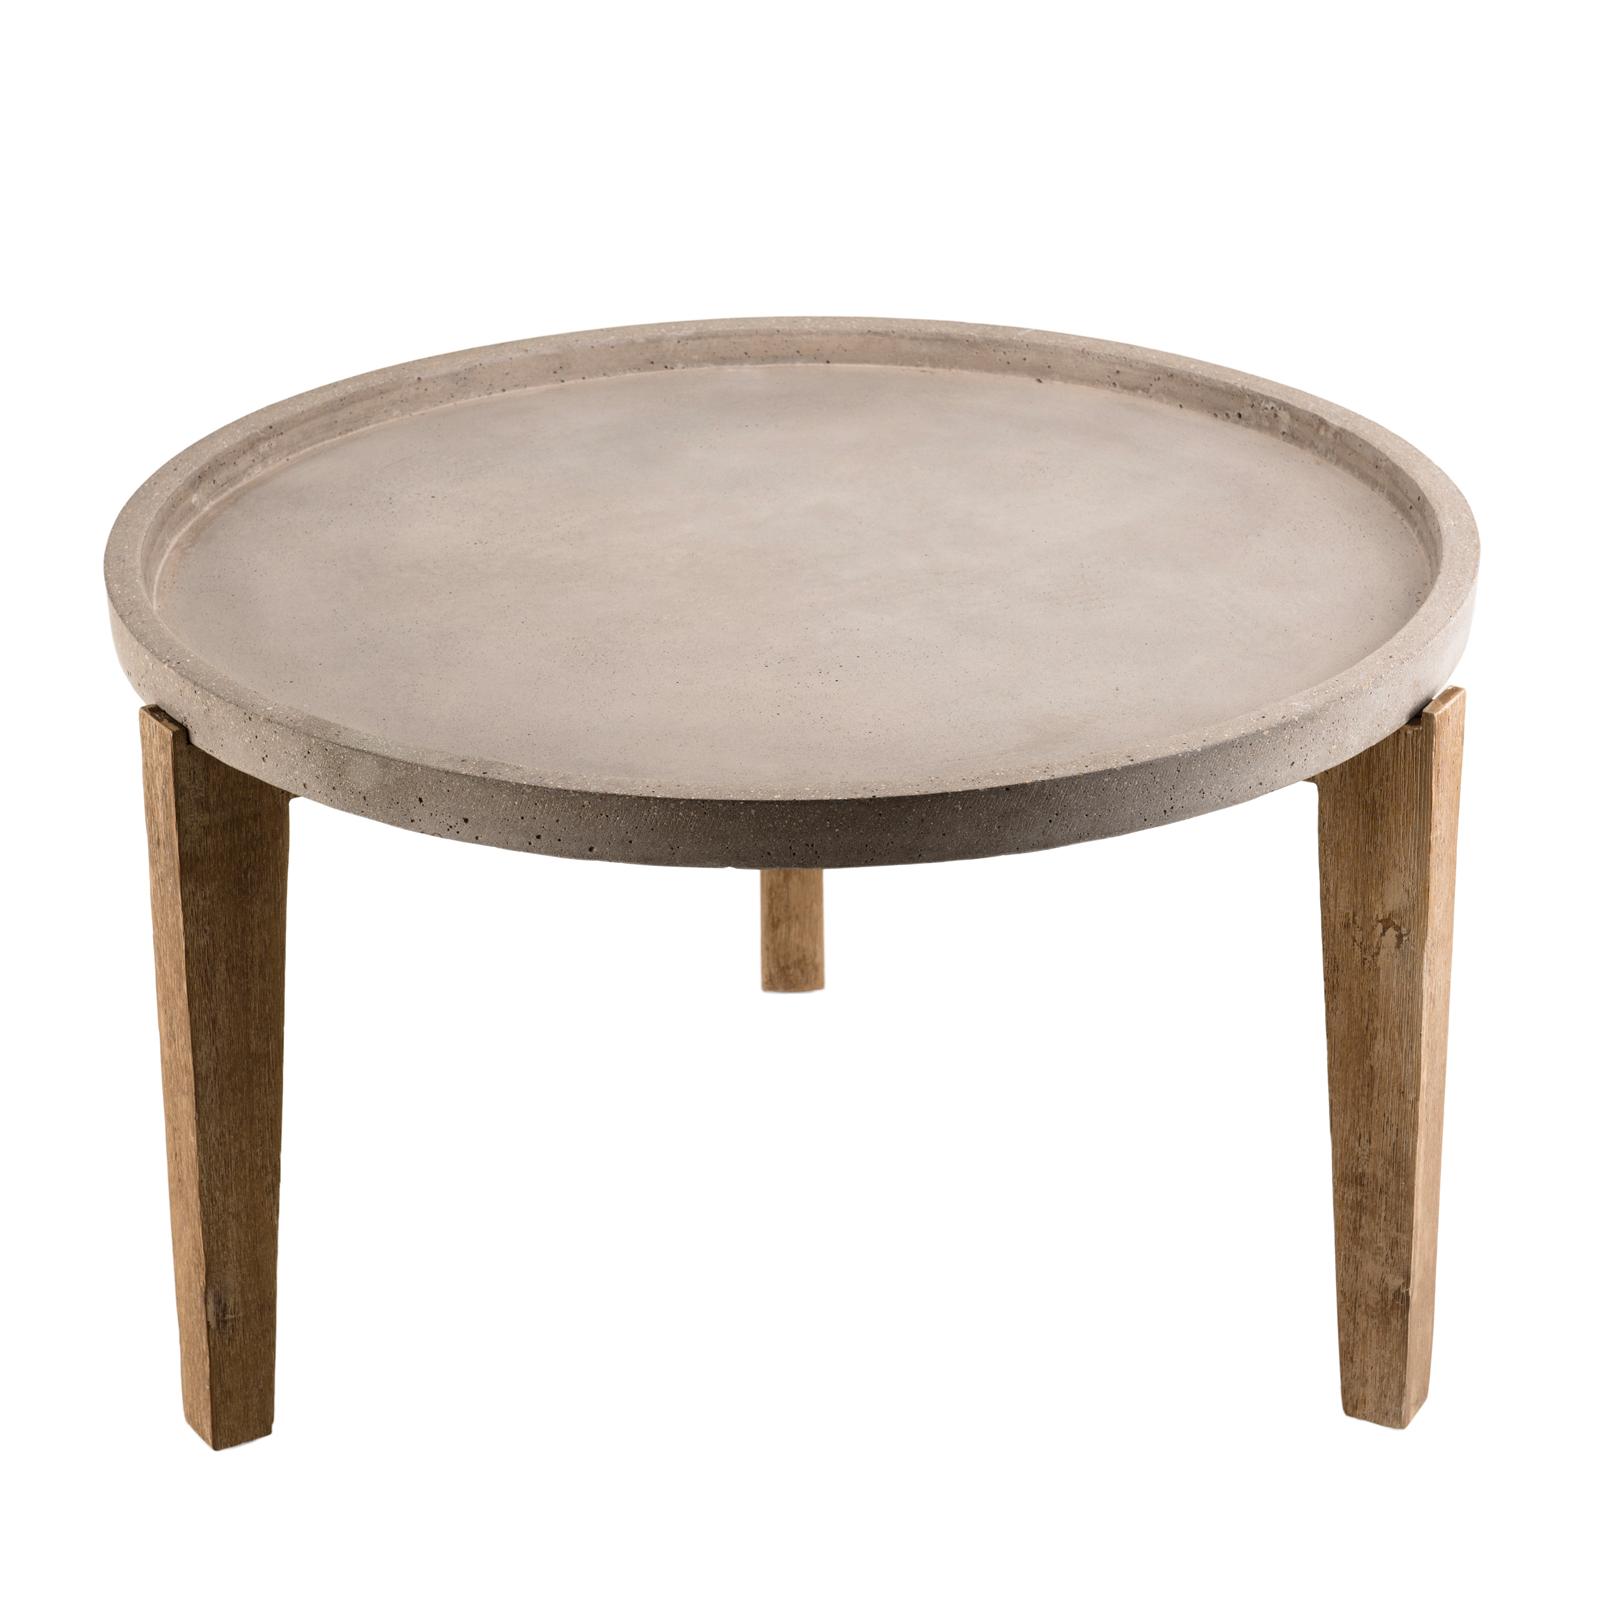 table basse jardin acacia beton forme ronde gm summer